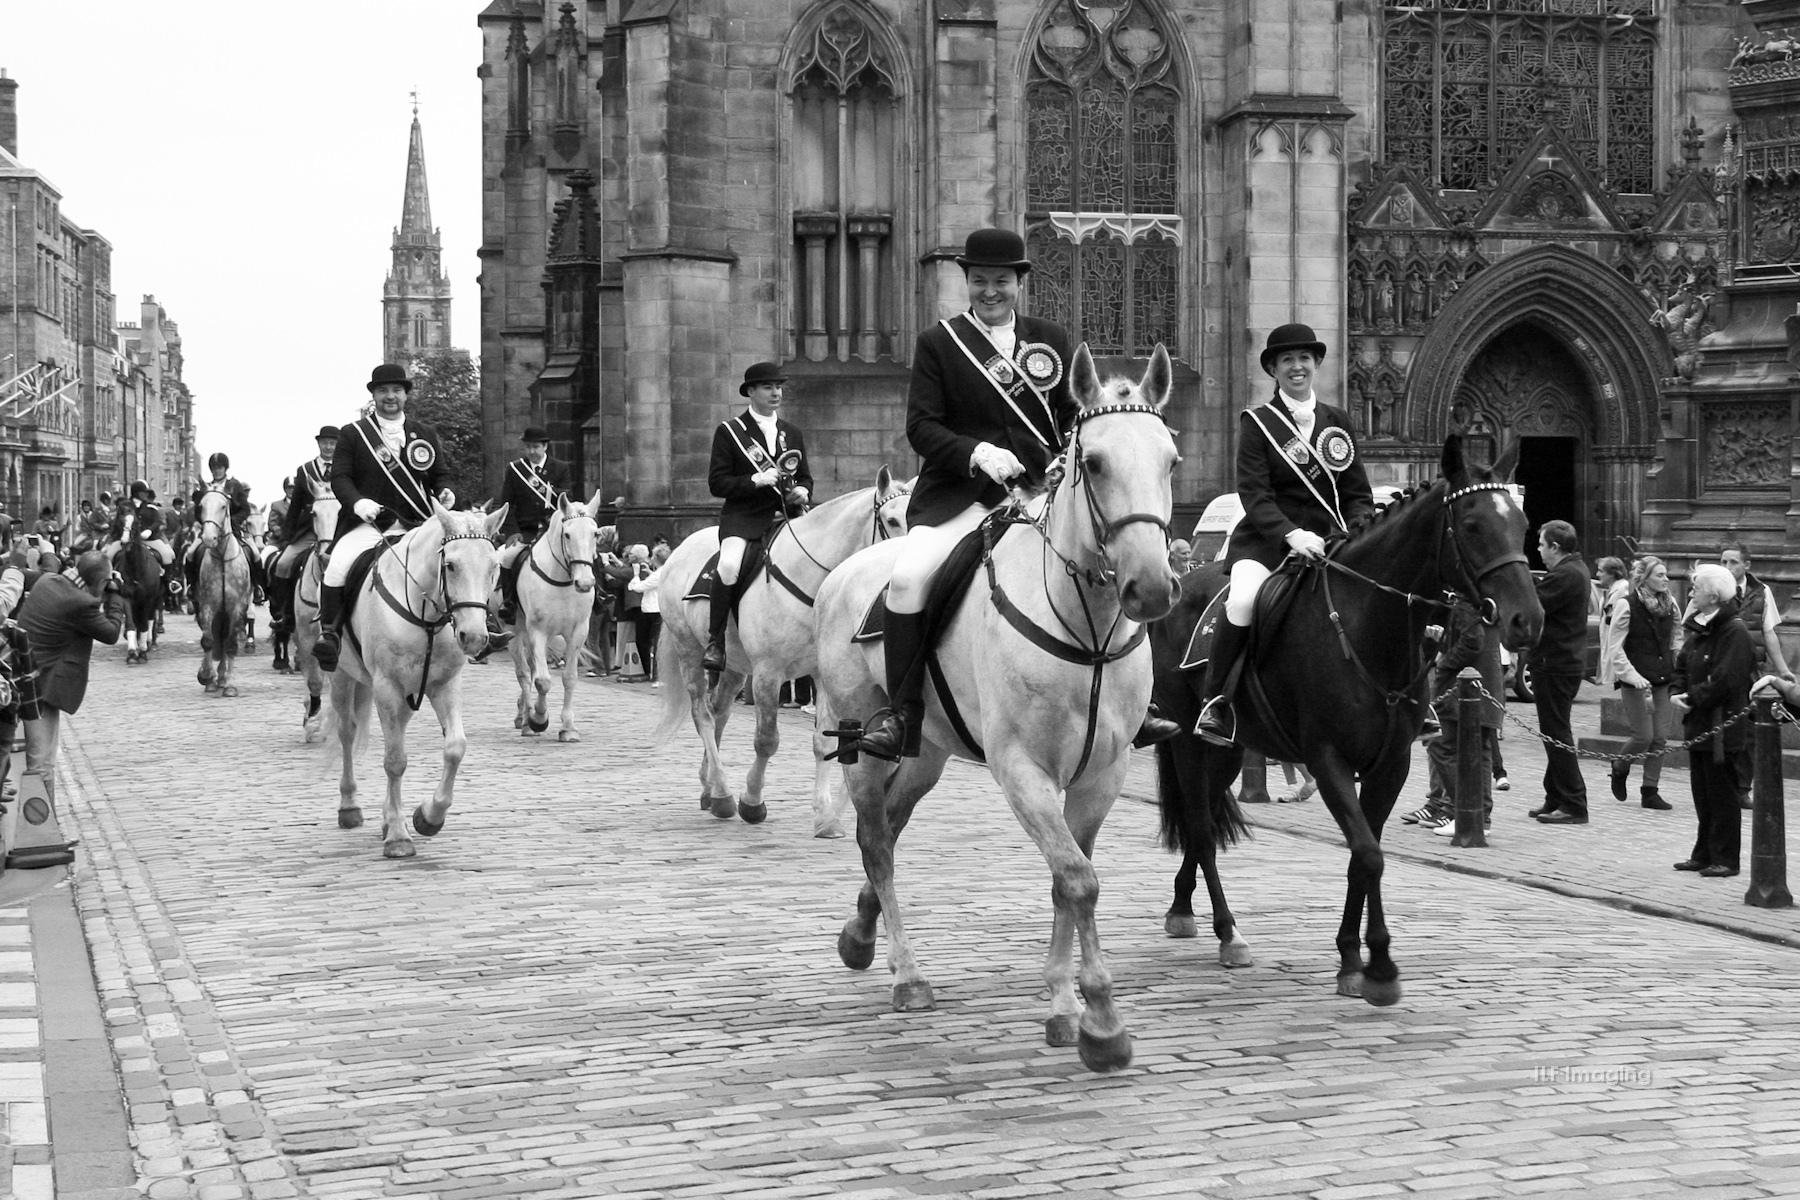 2014 Edinburgh Riding of the Marches